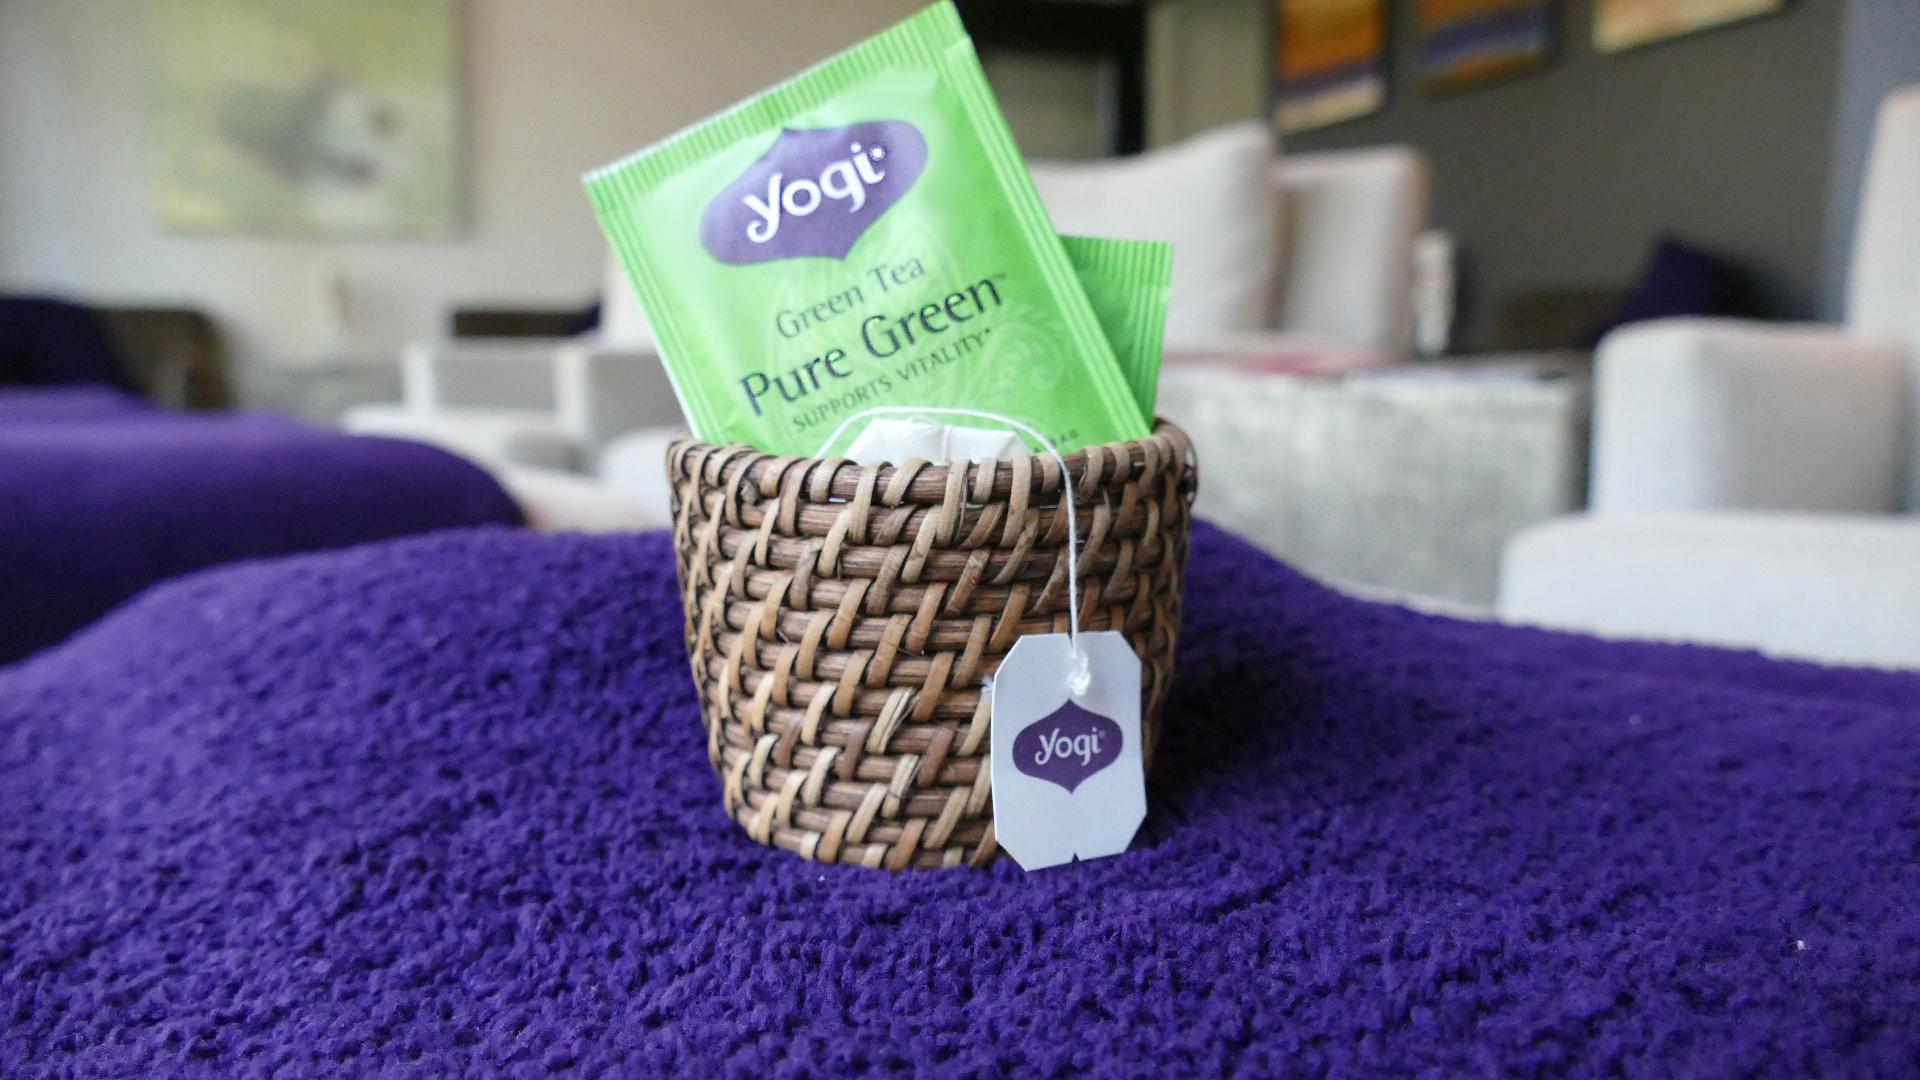 Yogi Green Tea